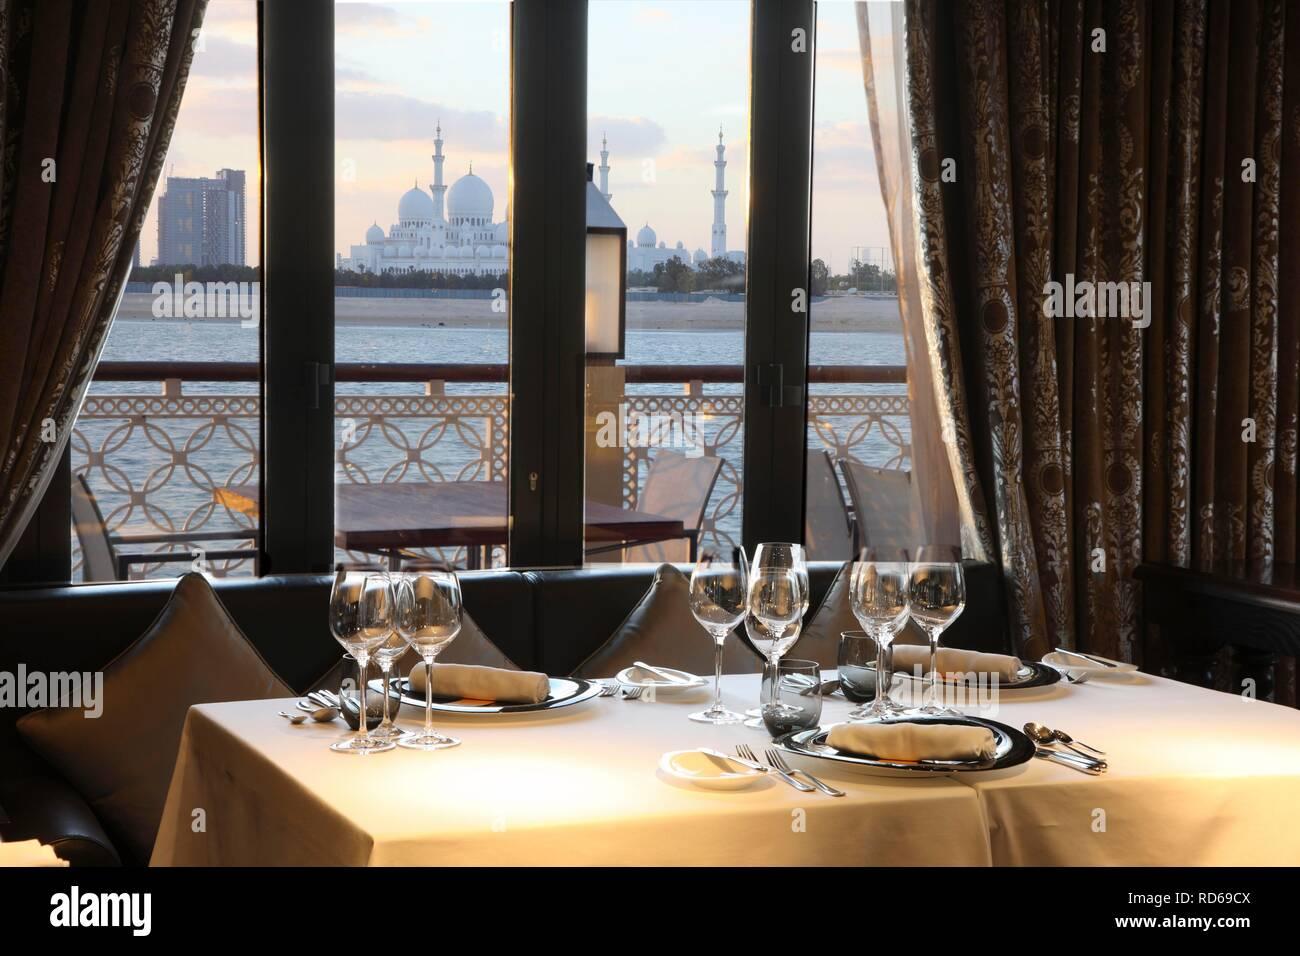 Shangri-La Hotel, Qaryat Al Beri, Pearls and Caviar